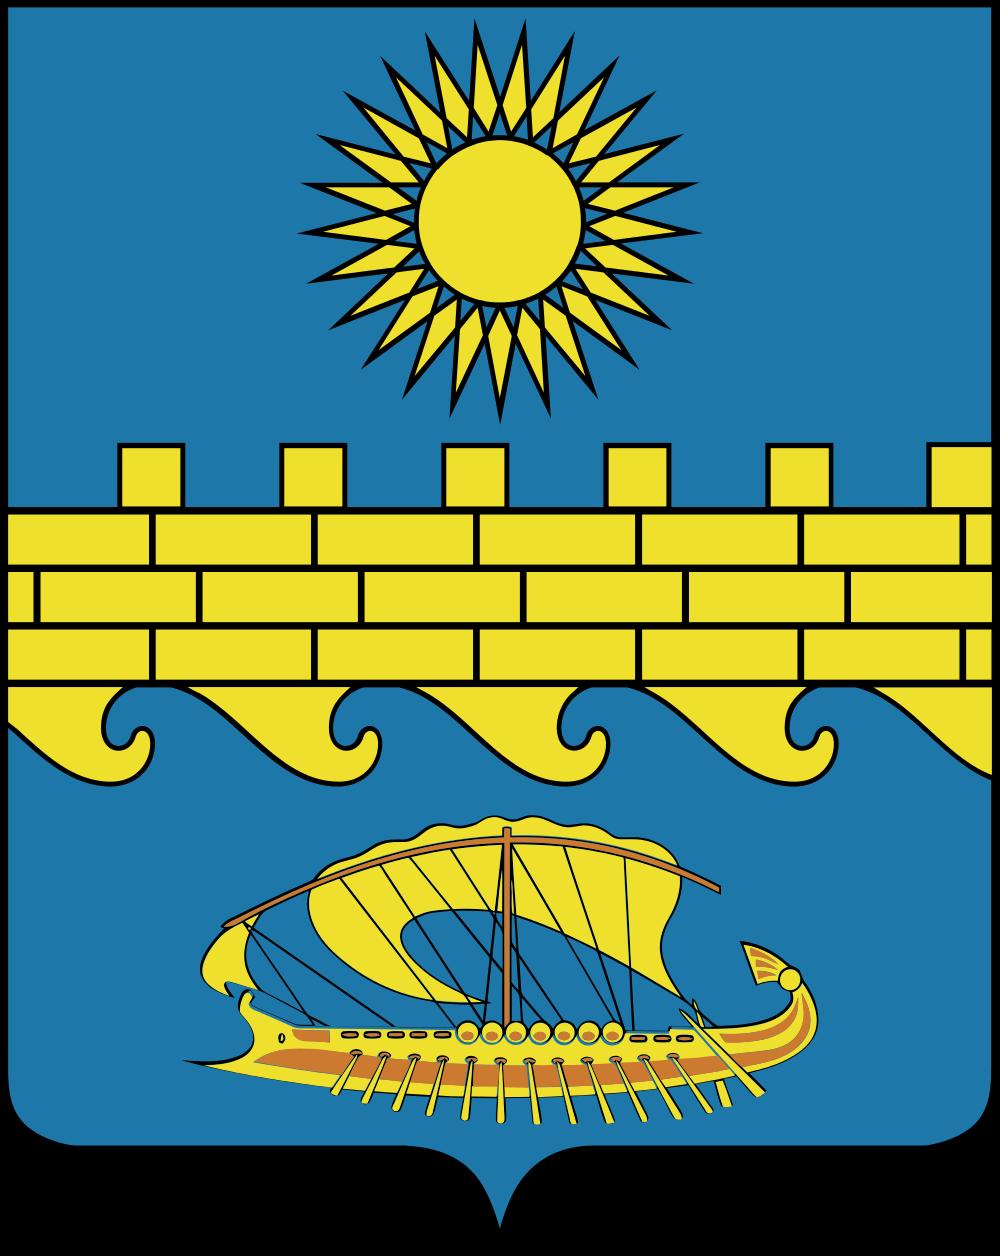 File:Coat of Arms of Anapa (Krasnodar krai).svg.